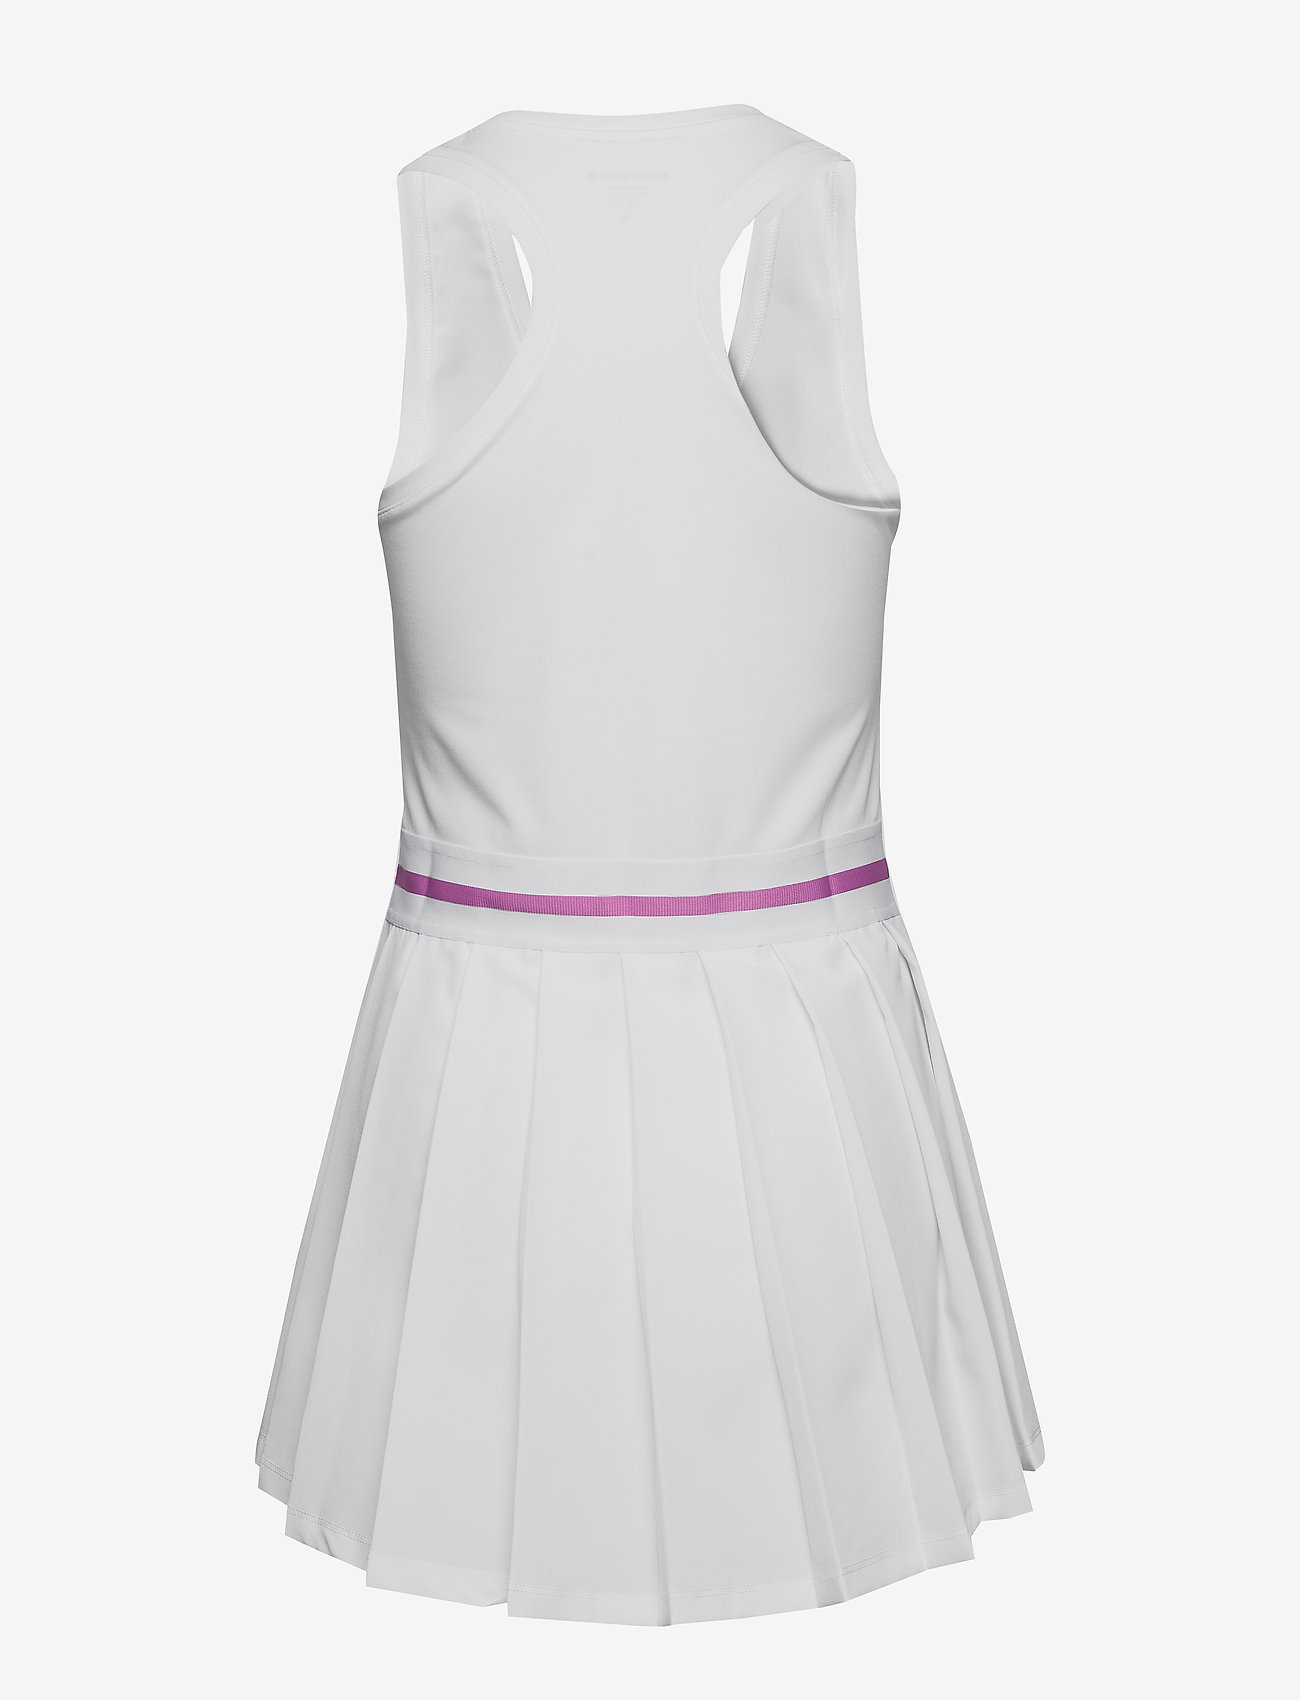 Björn Borg - DRESS TESS TESS - sports dresses - brilliant white - 1